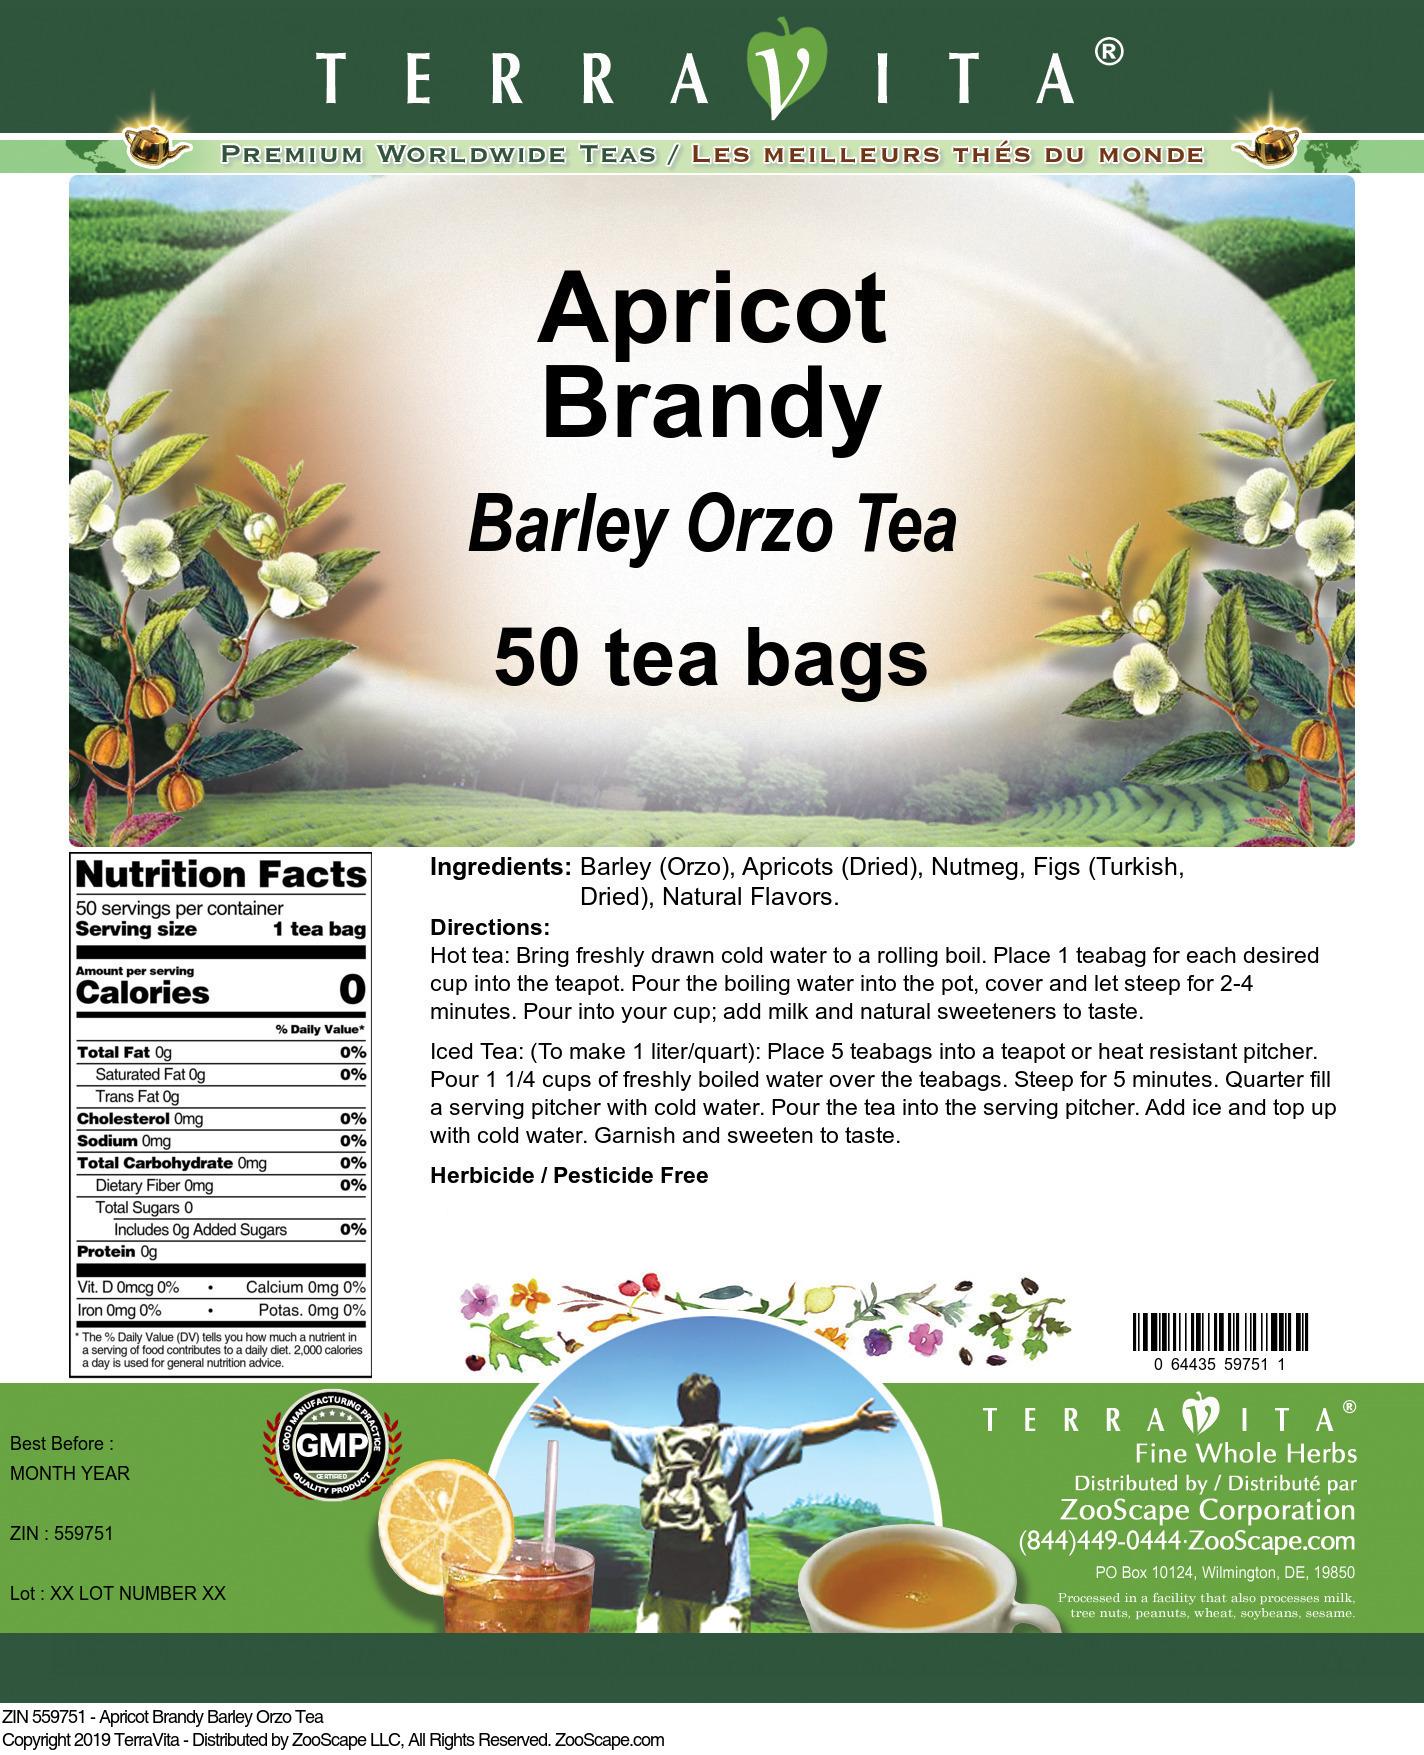 Apricot Brandy Barley Orzo